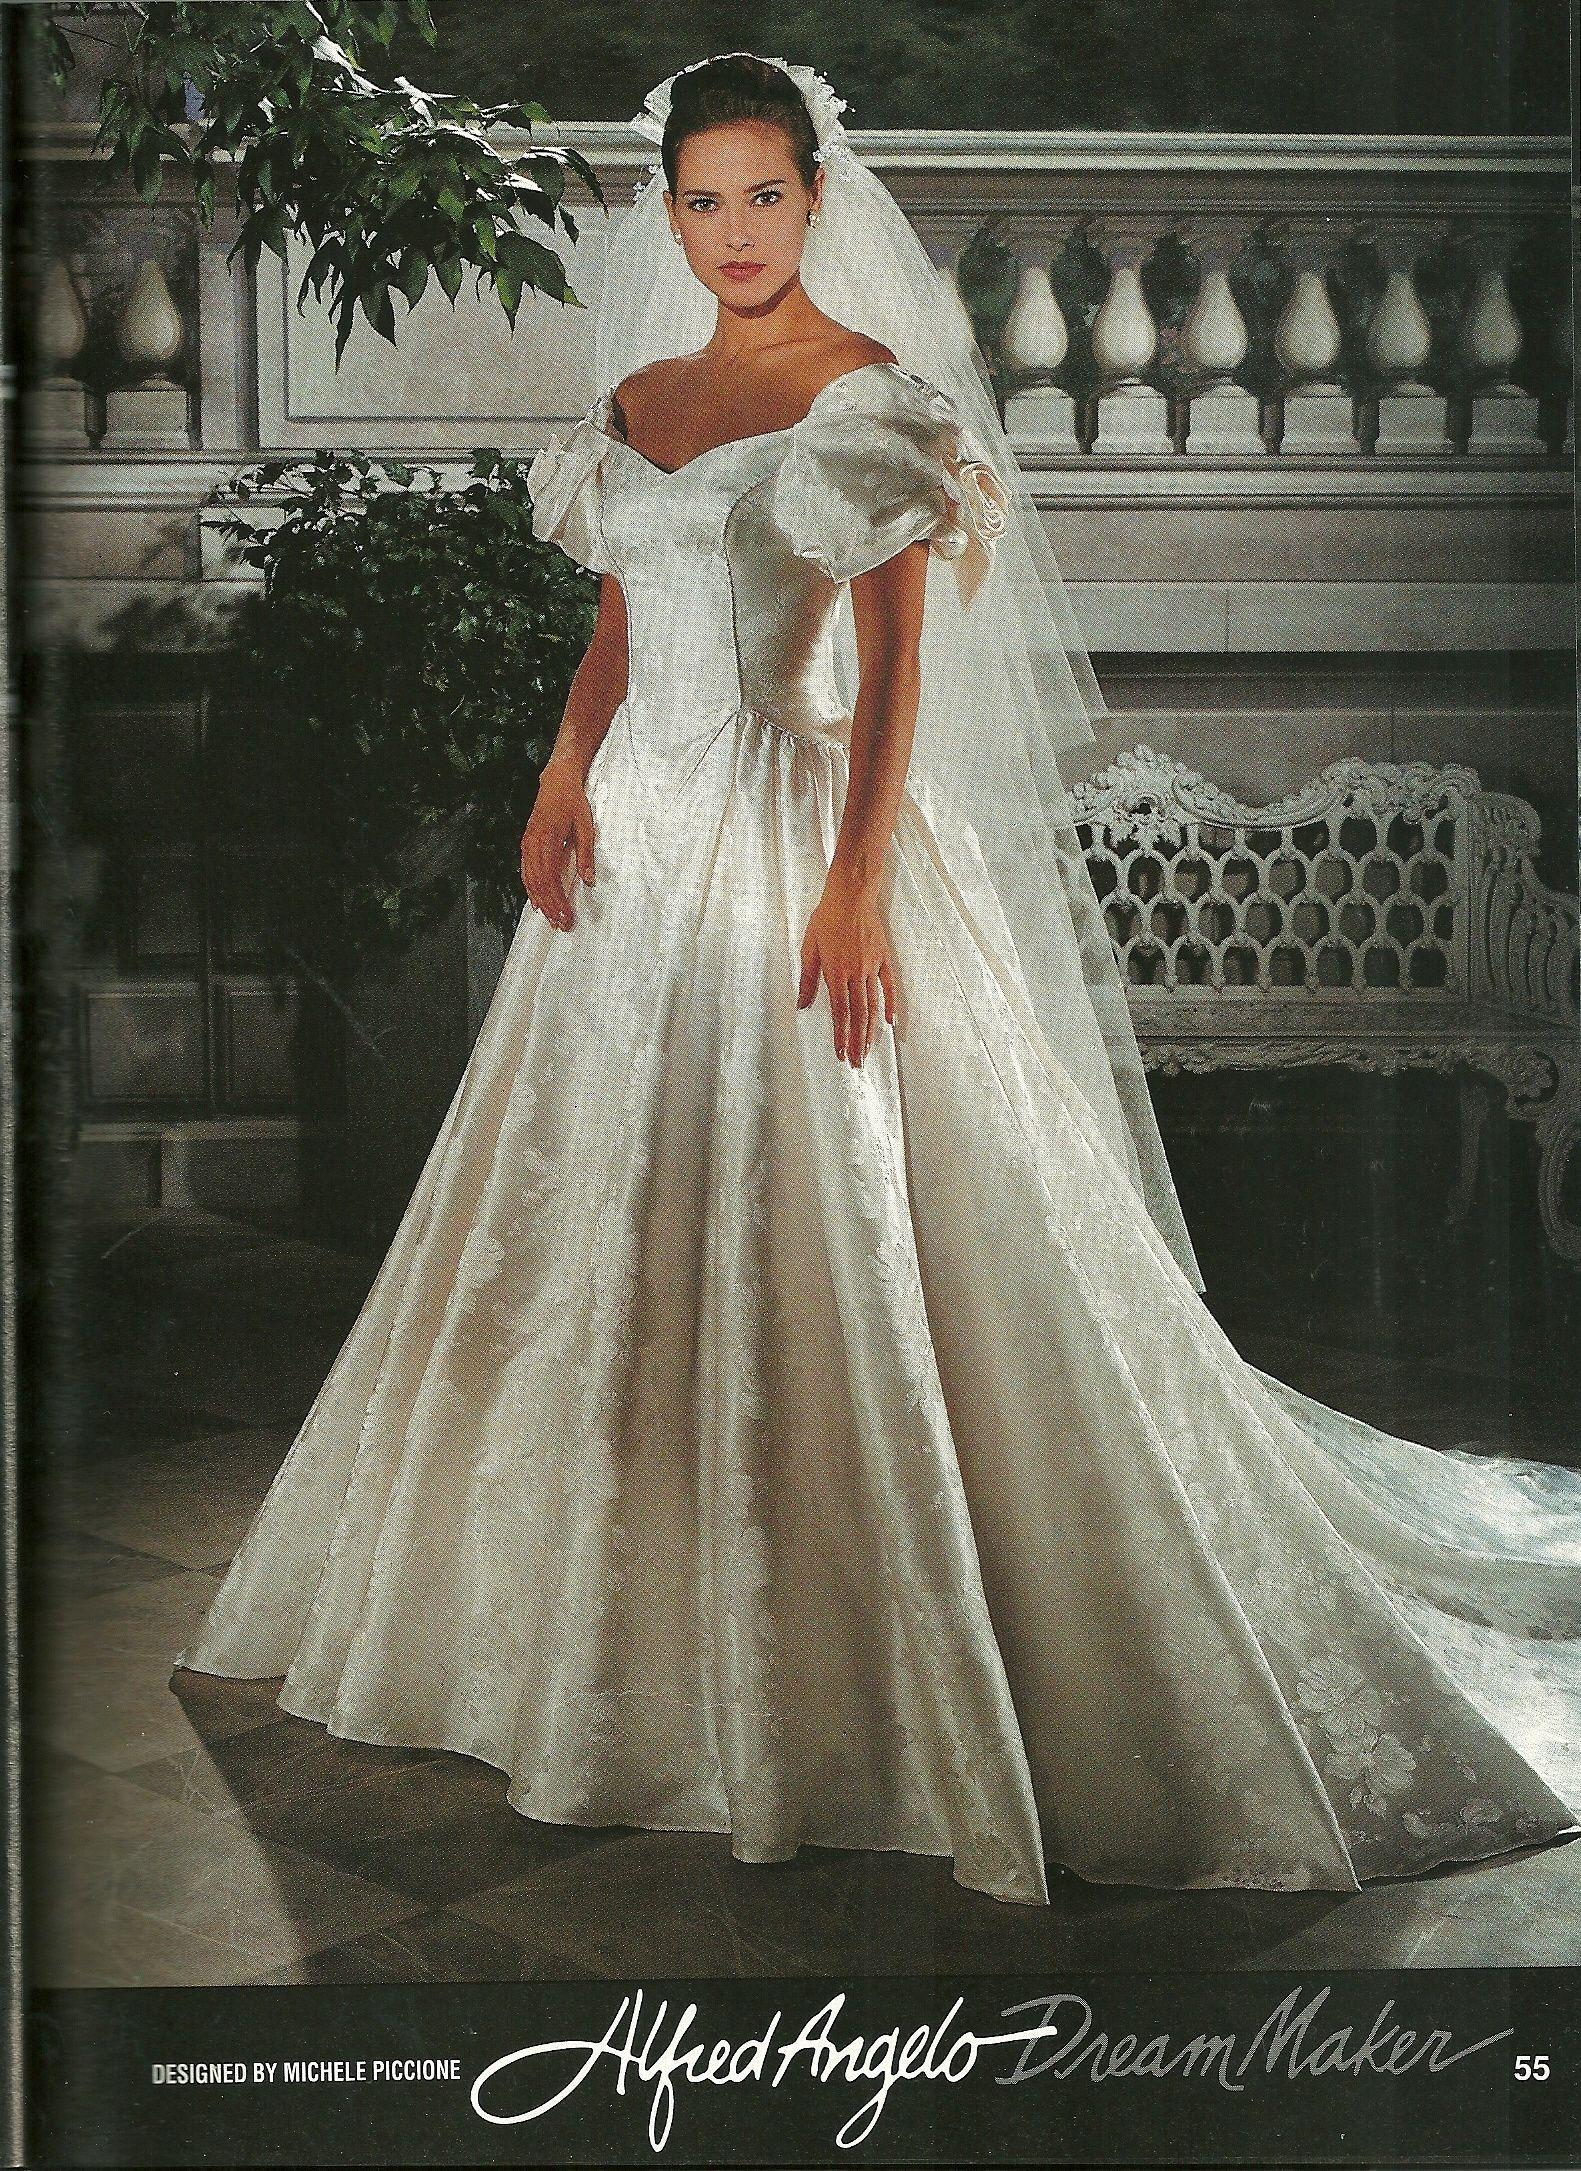 55 Lovely Vintage Wedding Dresses Cheap Graphics Wedding Dress Gallery Wedding Dresses 80s Vintage Wedding Dress Designers 90s Wedding Dress